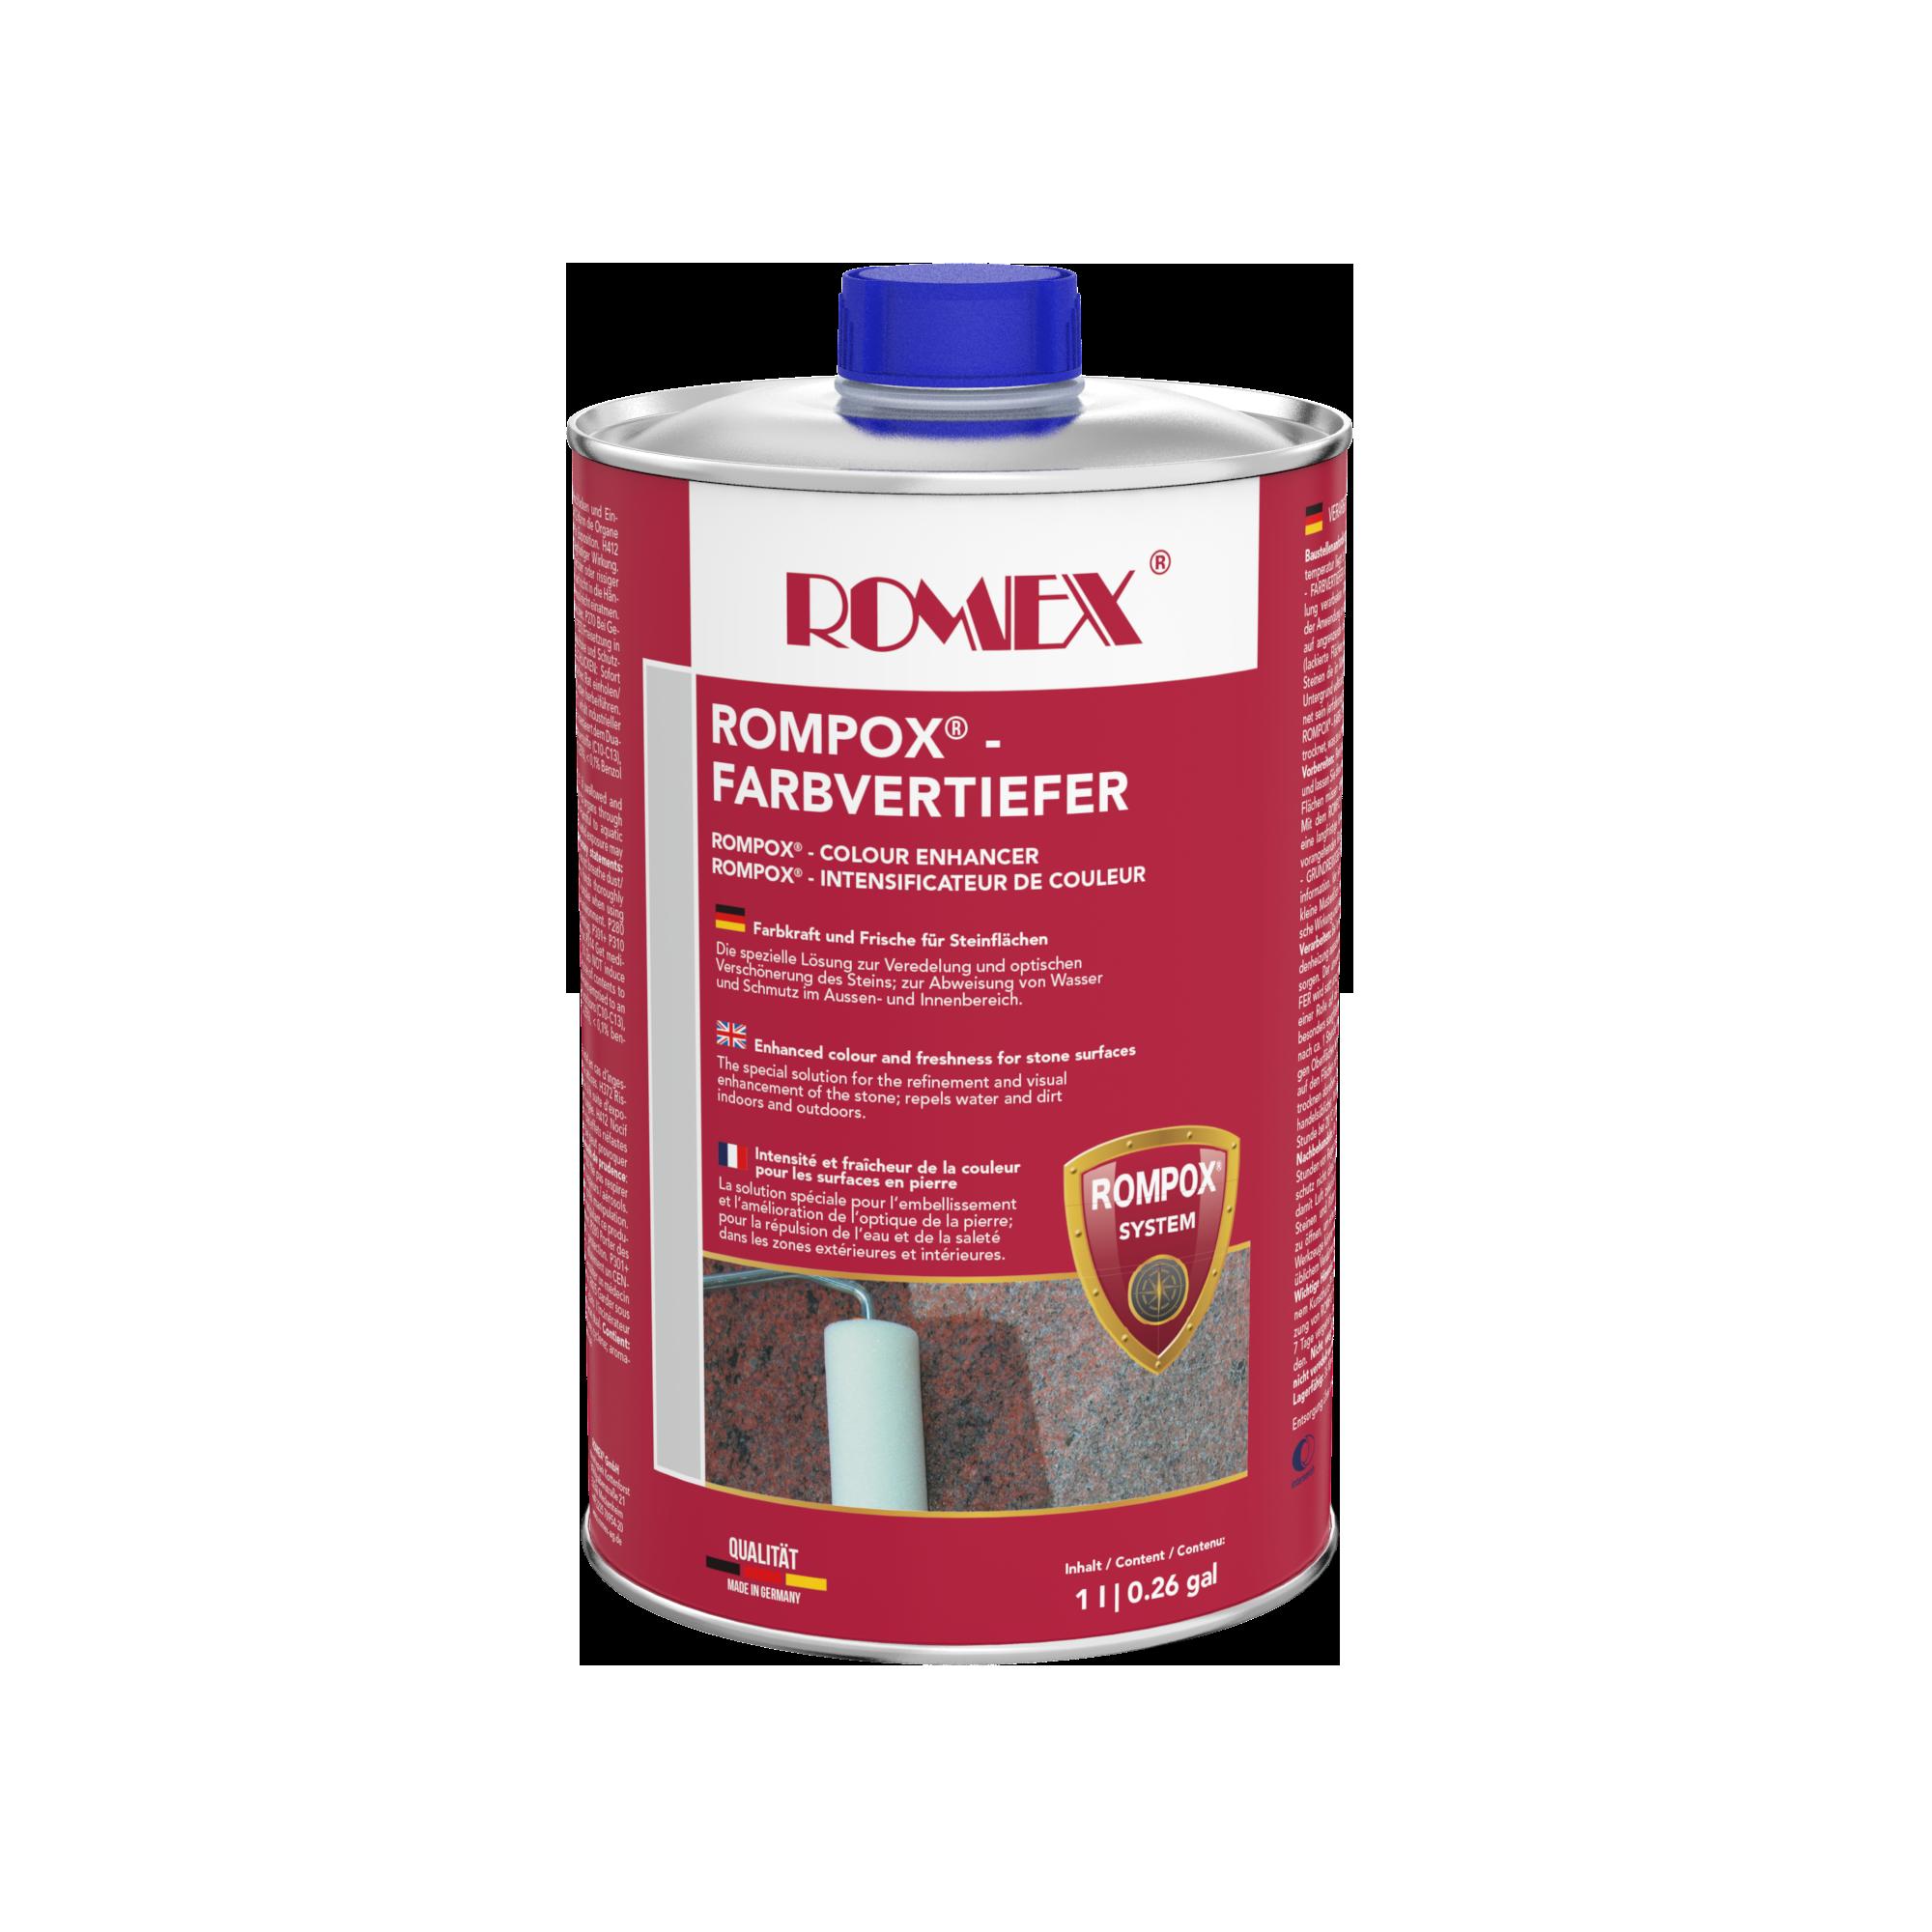 ROMPOX® - Farbvertiefer 1 - 10 Liter